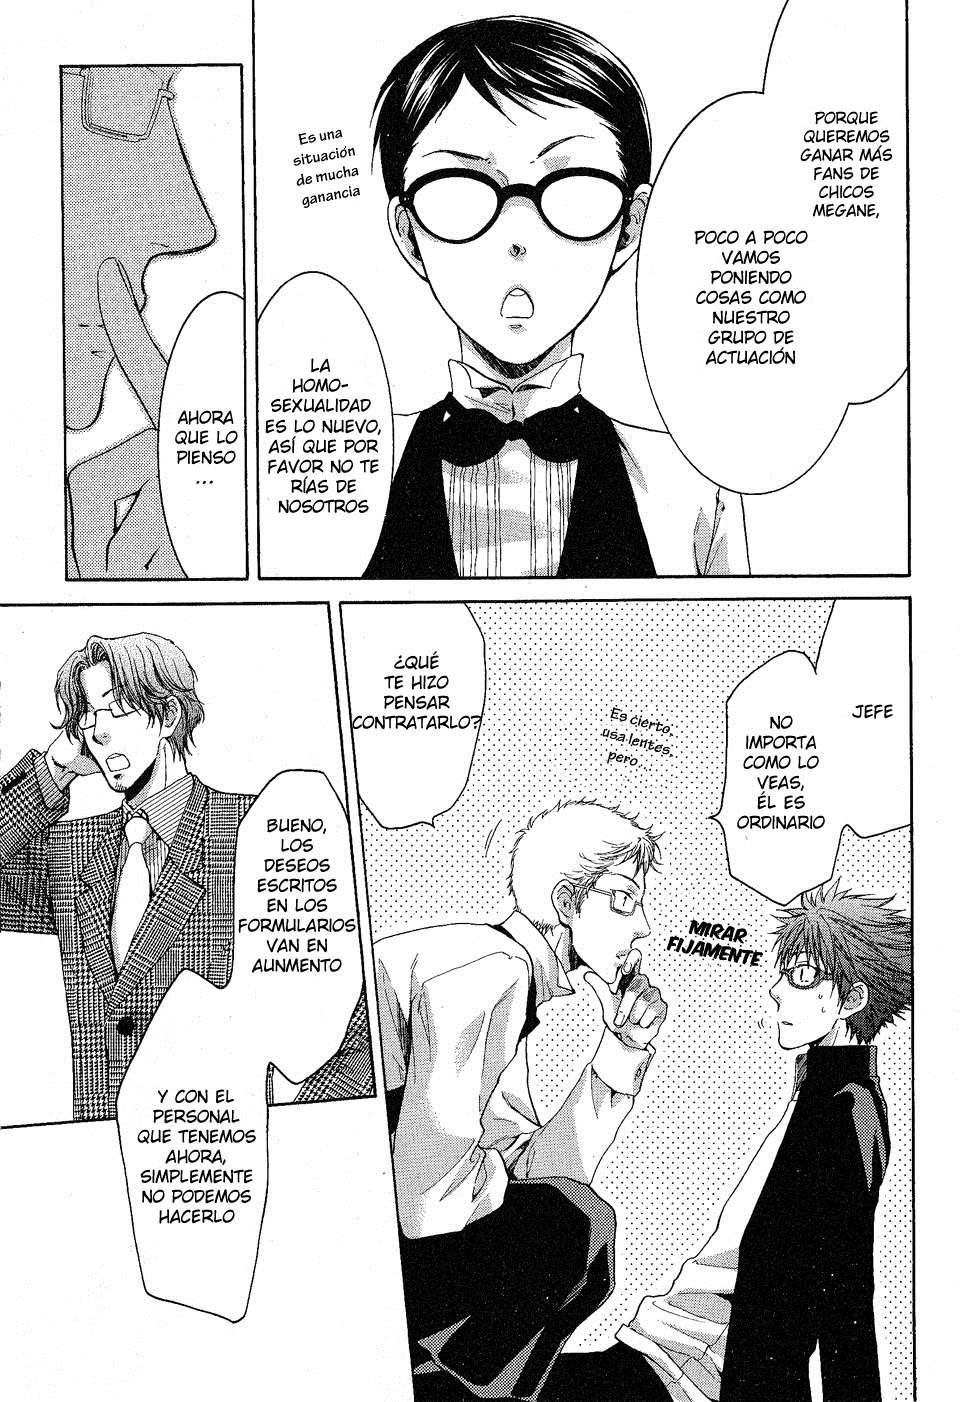 https://c5.ninemanga.com/es_manga/6/15814/378262/1e3b132d0b633e401b4407a971dd8c5a.jpg Page 39